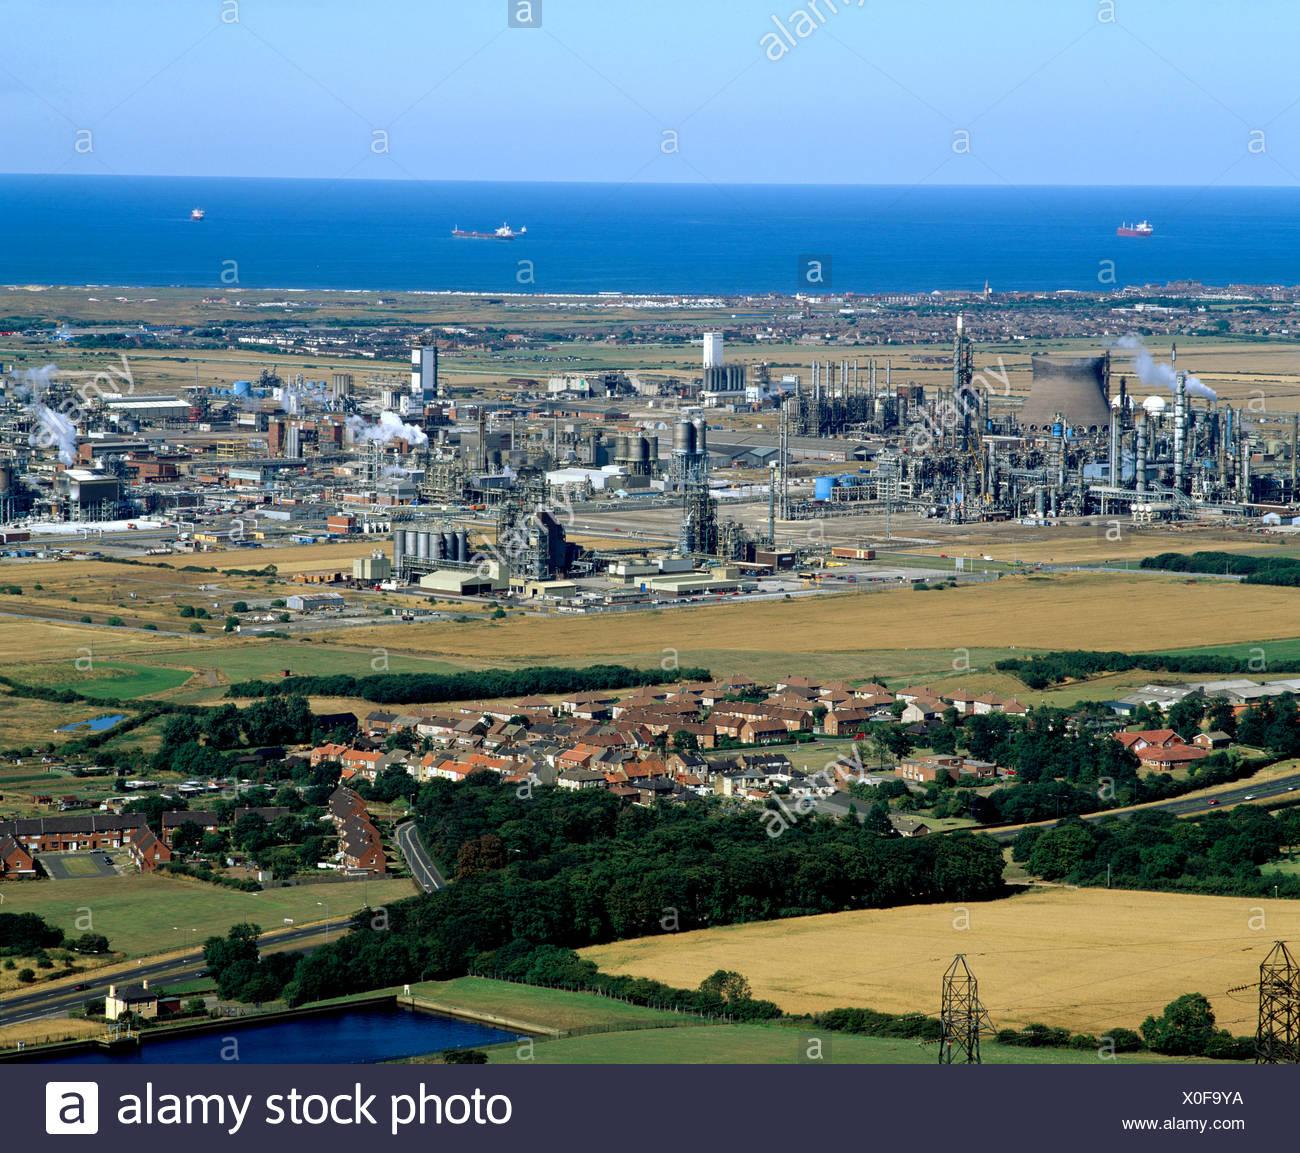 ICI Wilton chemical plant Teeside NE England - Stock Image